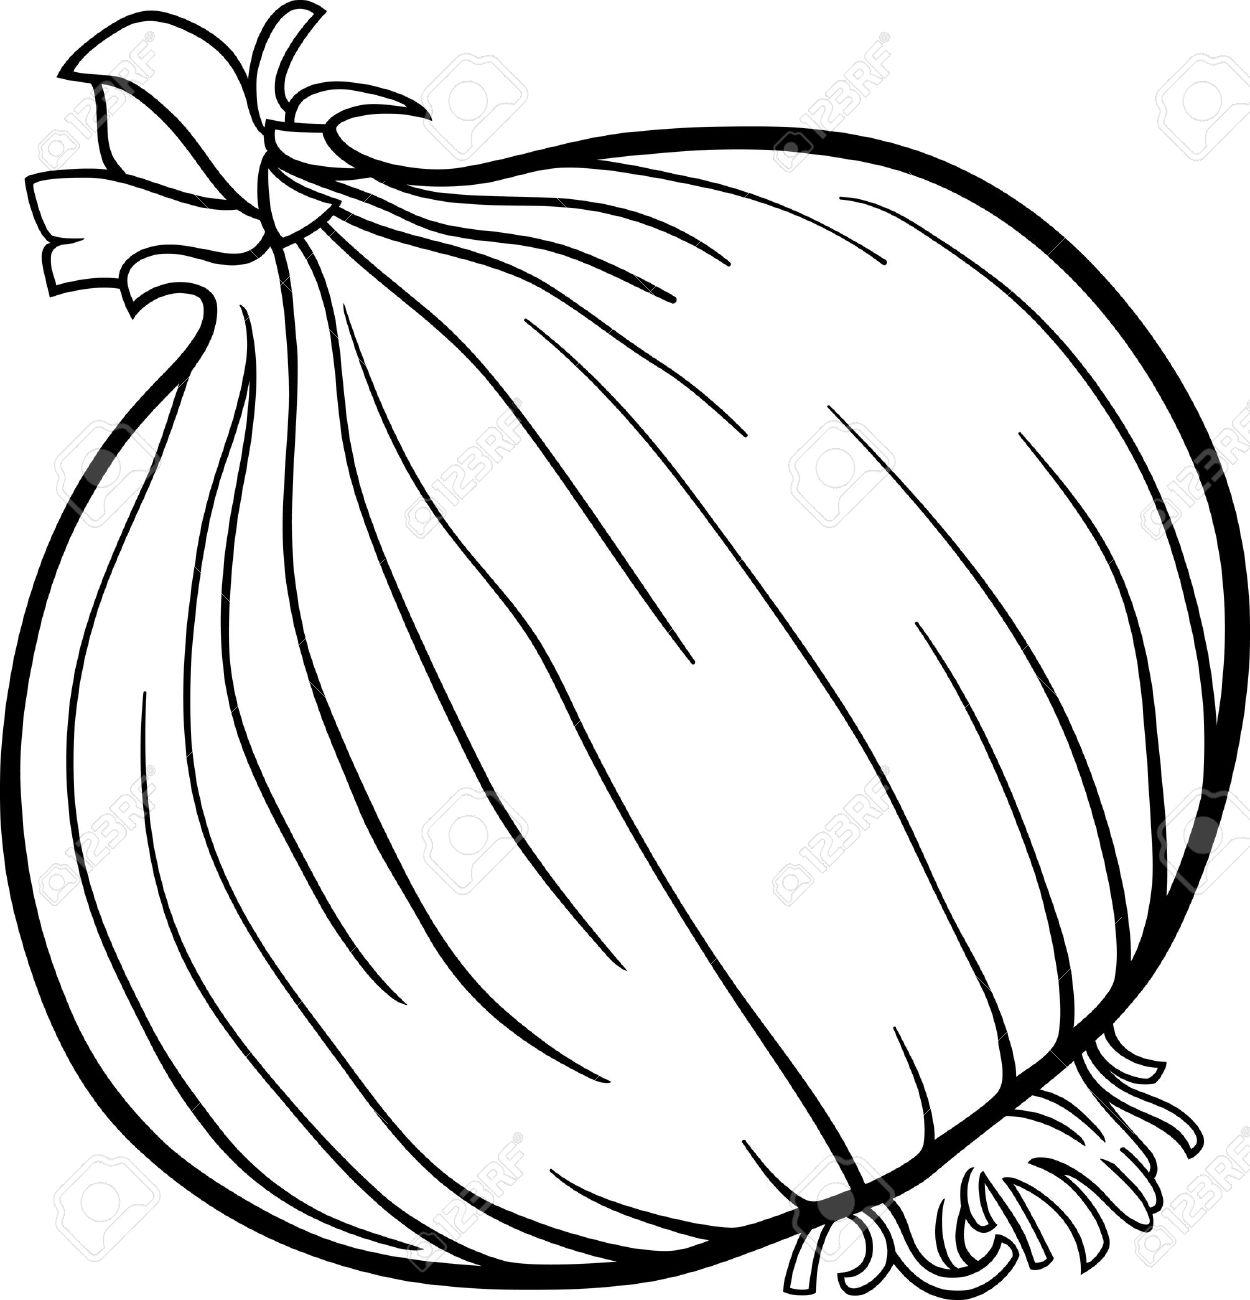 Vegetables Black And White Black Clipart Gclipart